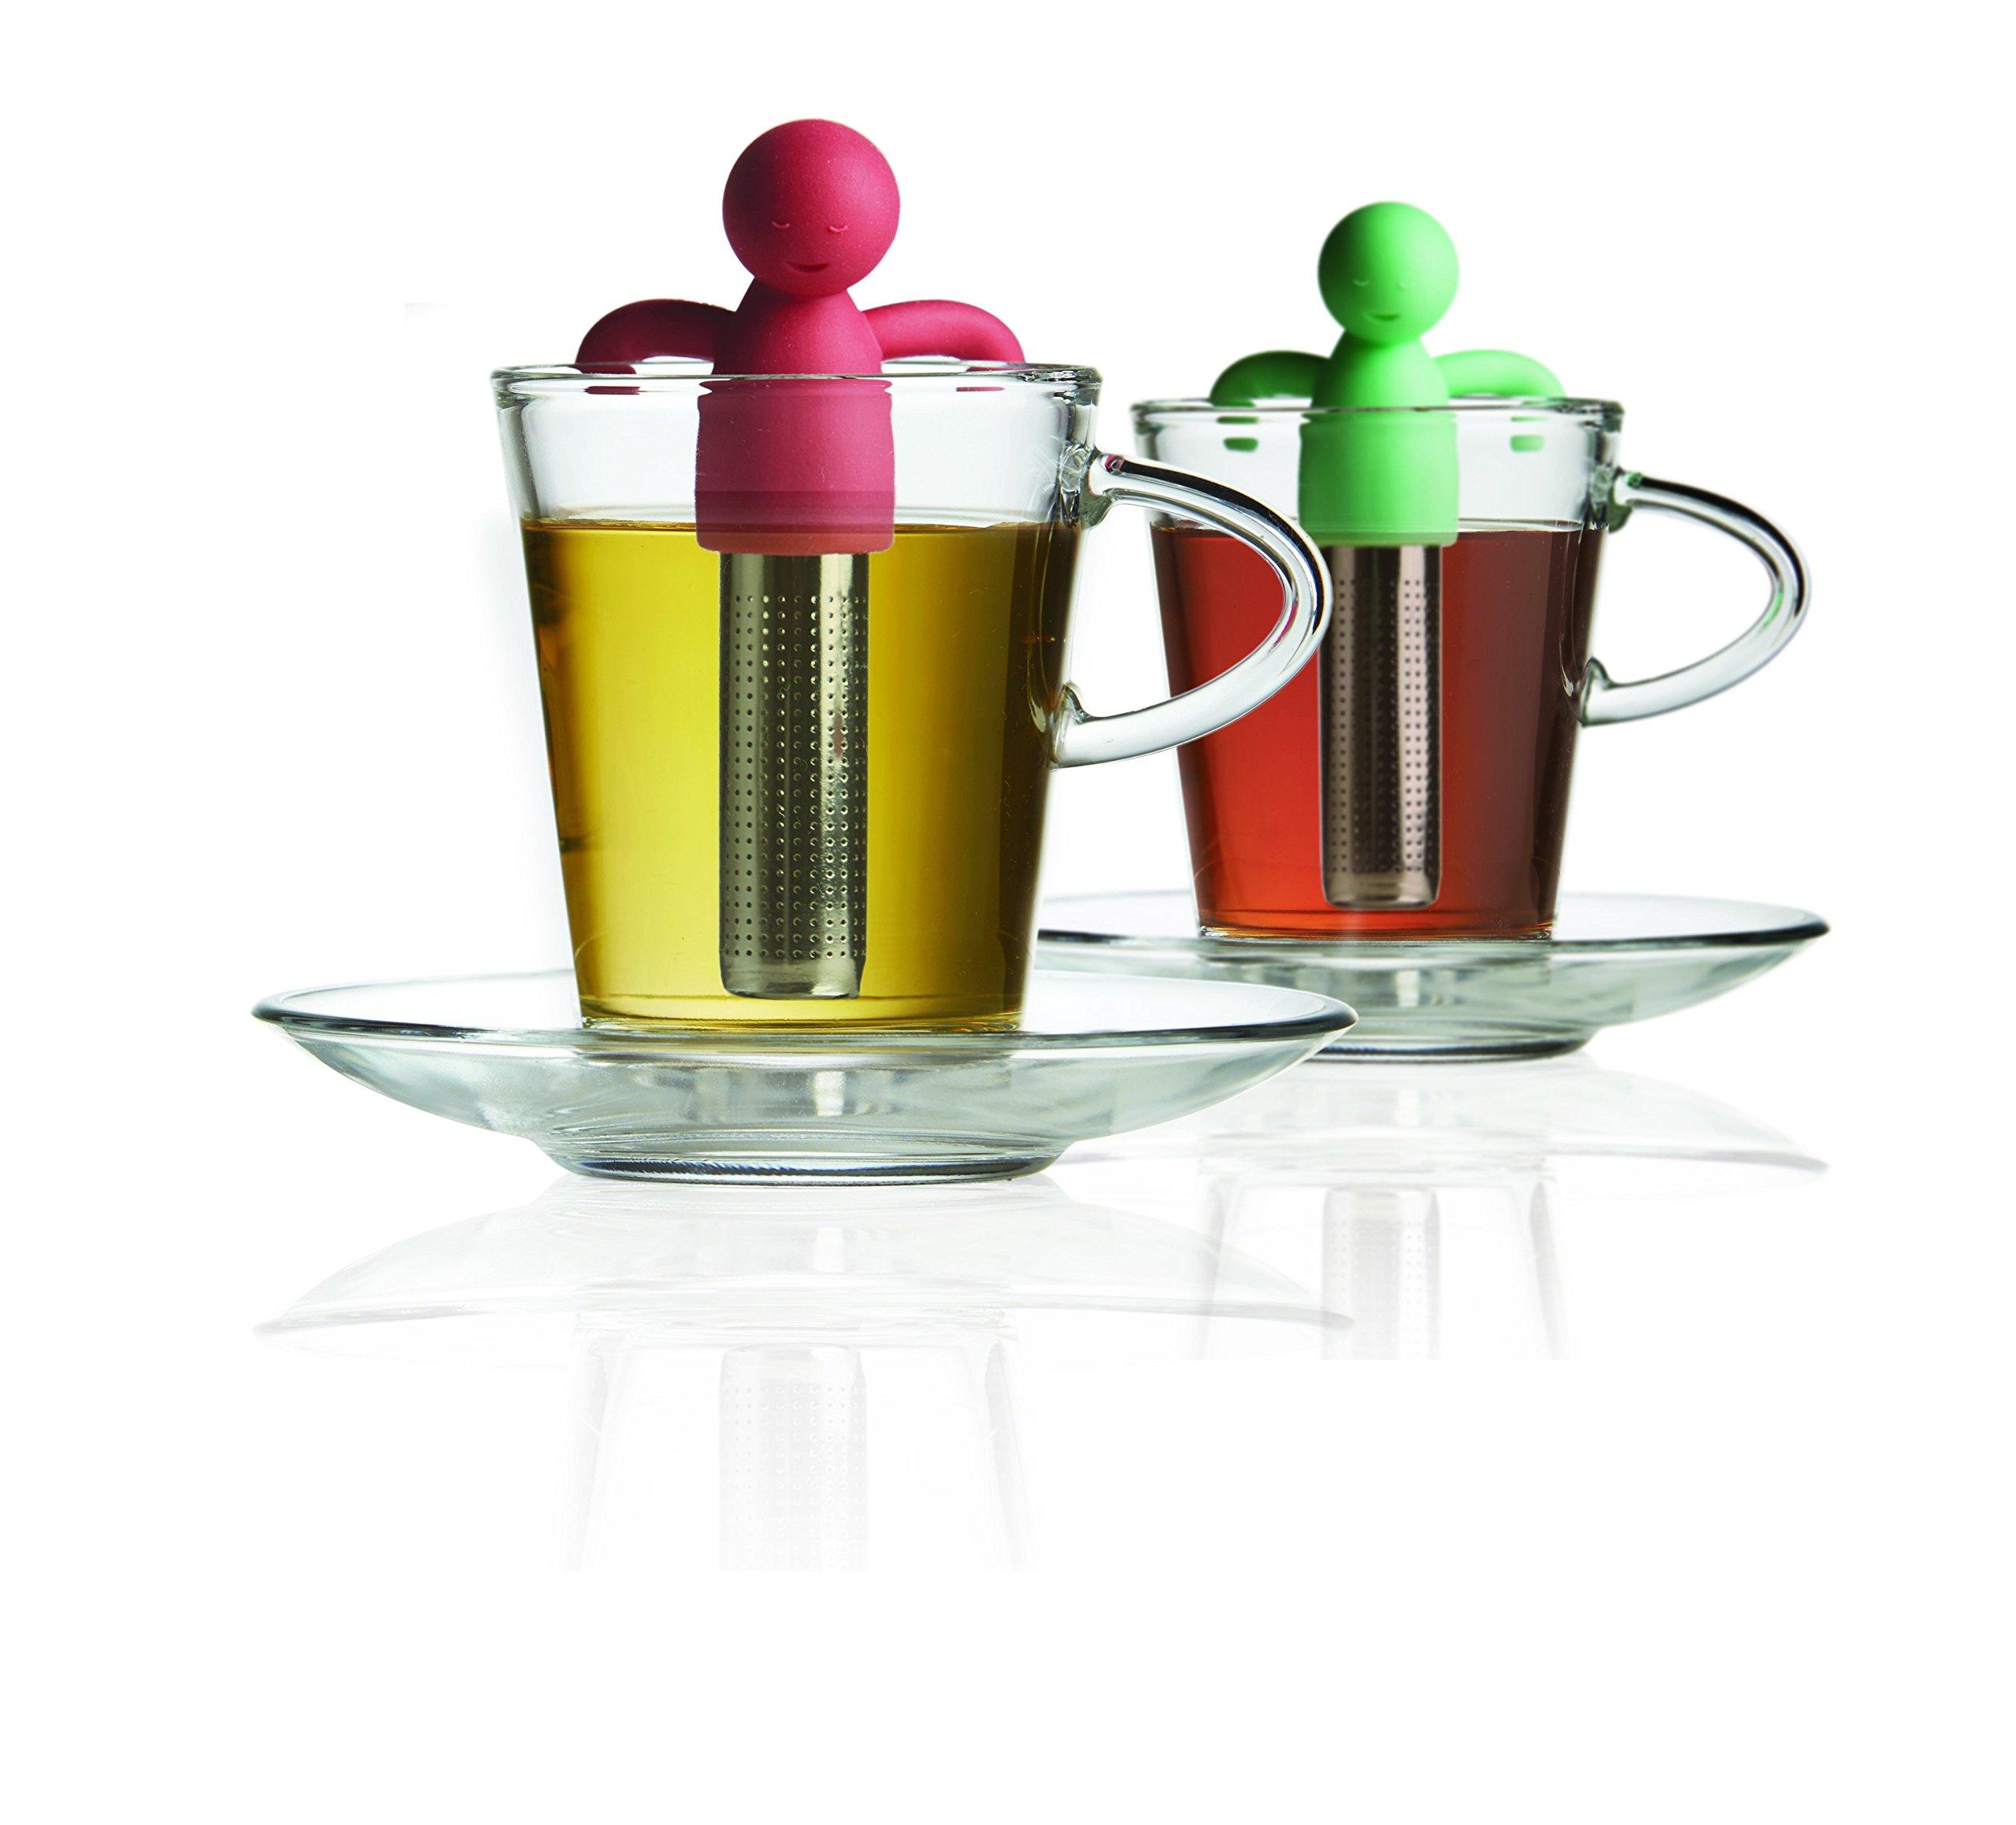 Tandem 6 Piece Teacup Set